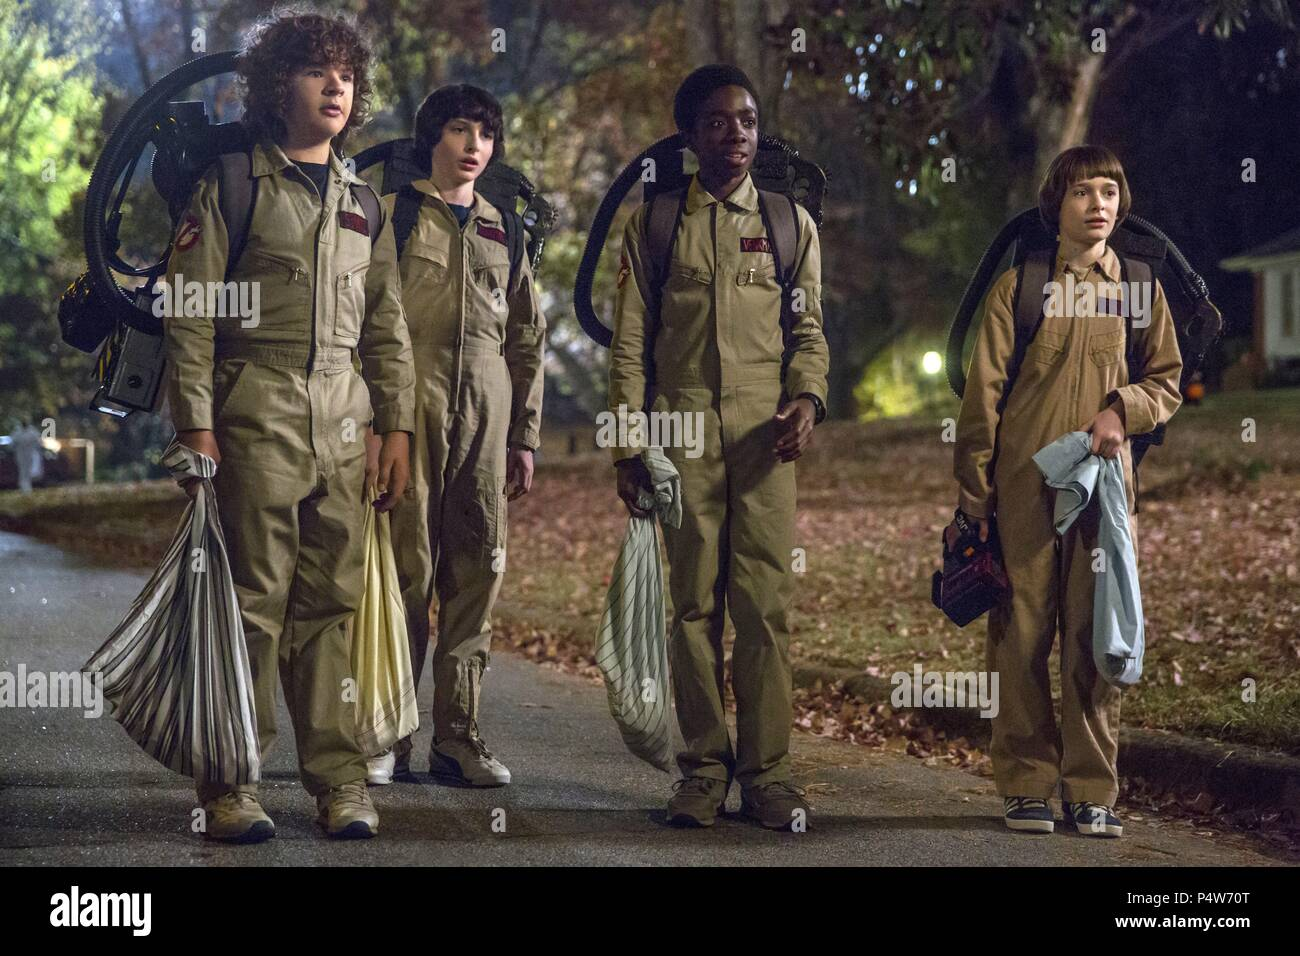 Description: Season 2.  Original Film Title: STRANGER THINGS.  English Title: STRANGER THINGS.  Film Director: MATT DUFFER; ROSS DUFFER.  Year: 2016.  Stars: GATEN MATARAZZO; CALEB MCLAUGHLIN; FINN WOLFHARD; NOAH SCHNAPP. Credit: 21 LAPS ENT/MONKEY MASSACRE / Album - Stock Image